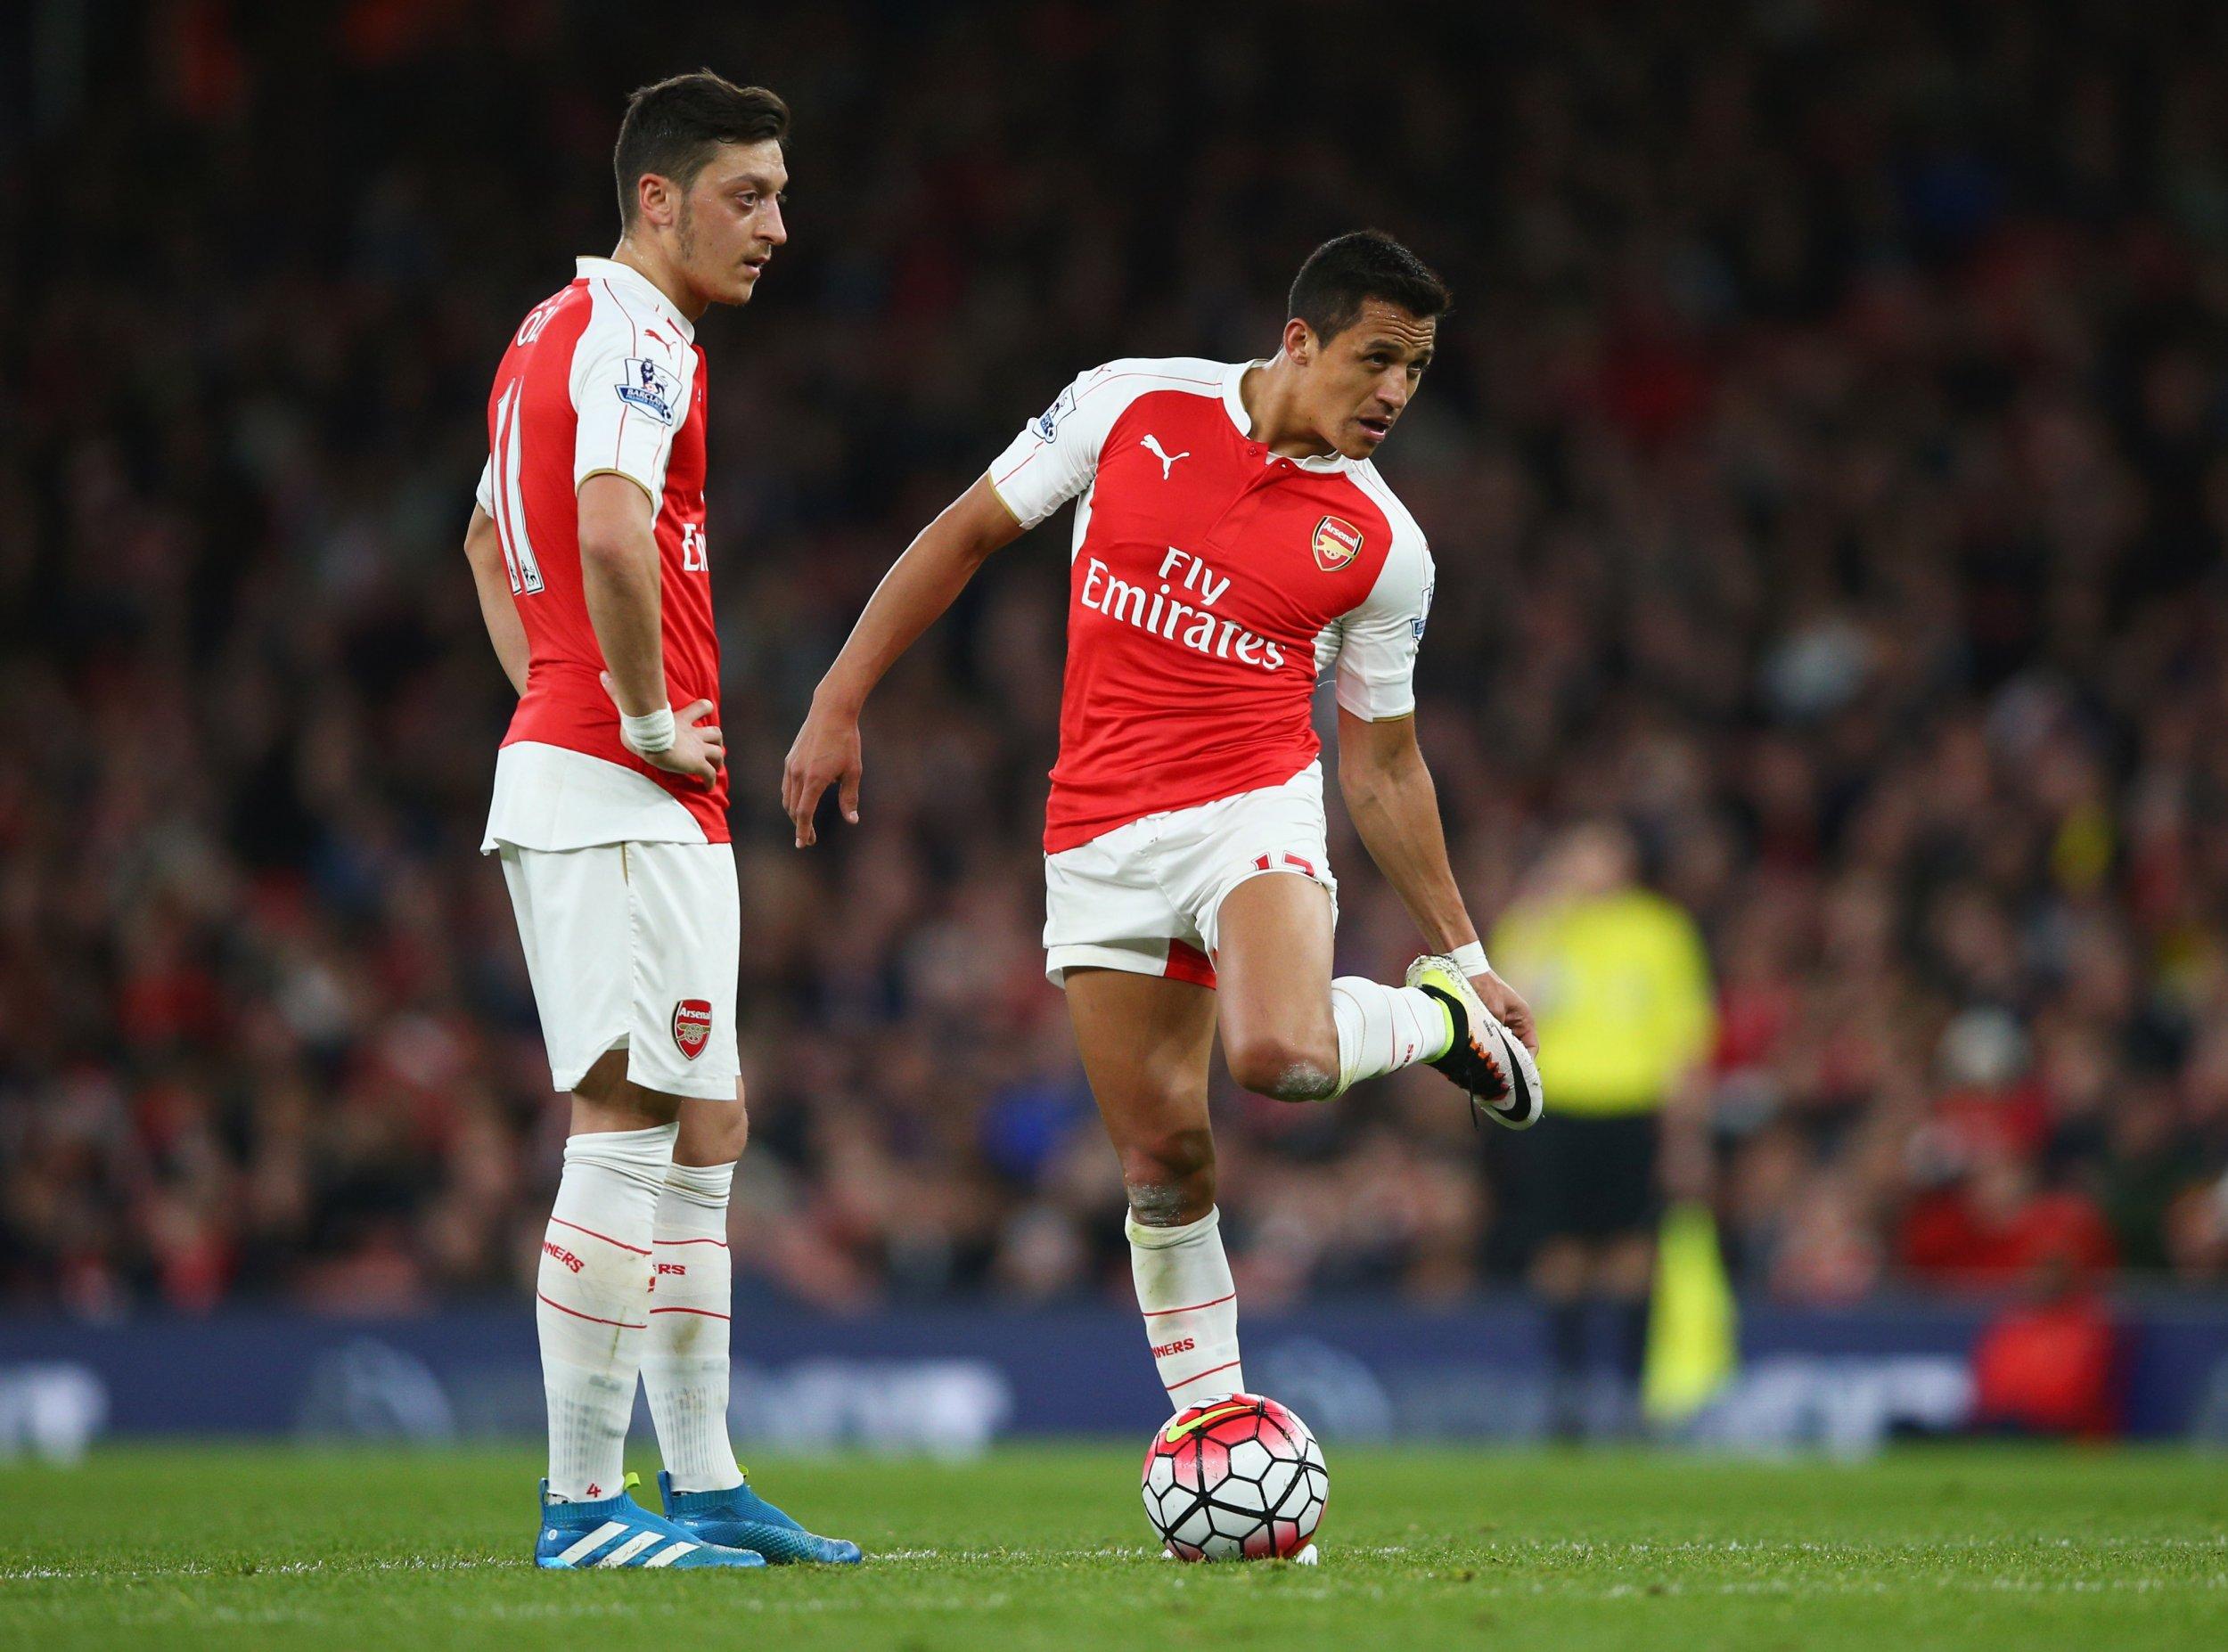 Mesut Ozil, left, with Arsenal teammate Alexis Sanchez